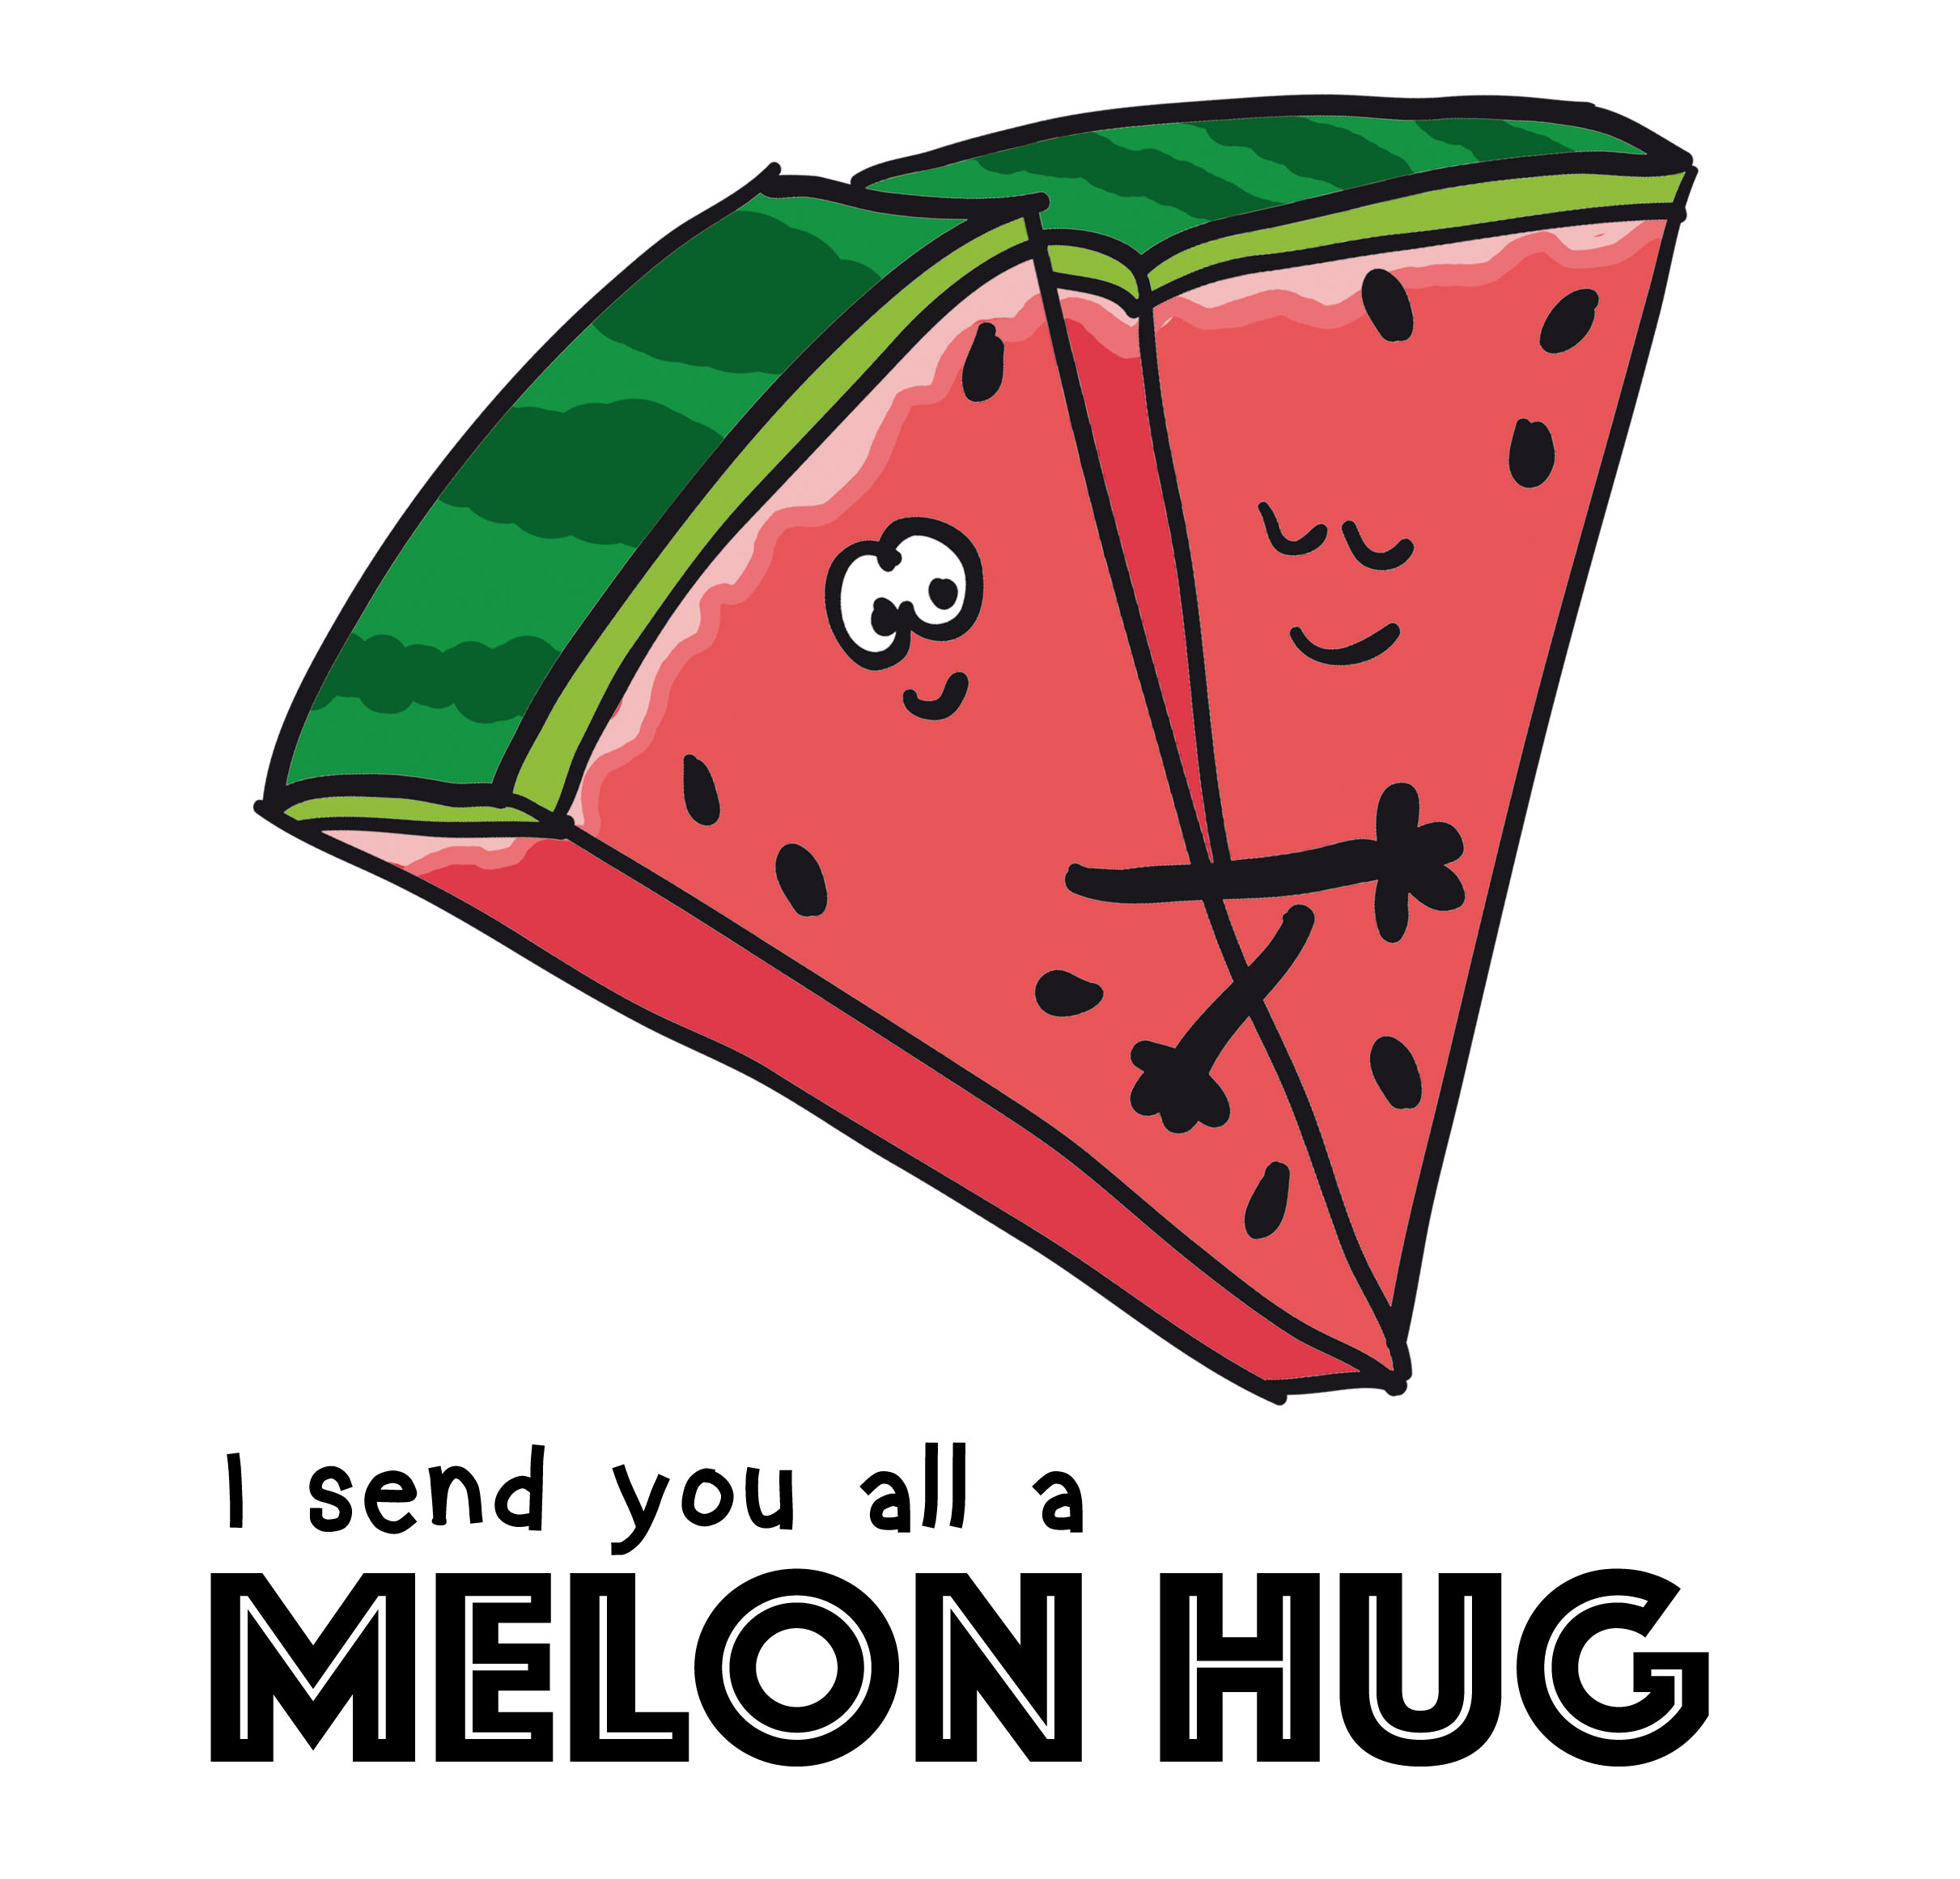 send you all a melon hug